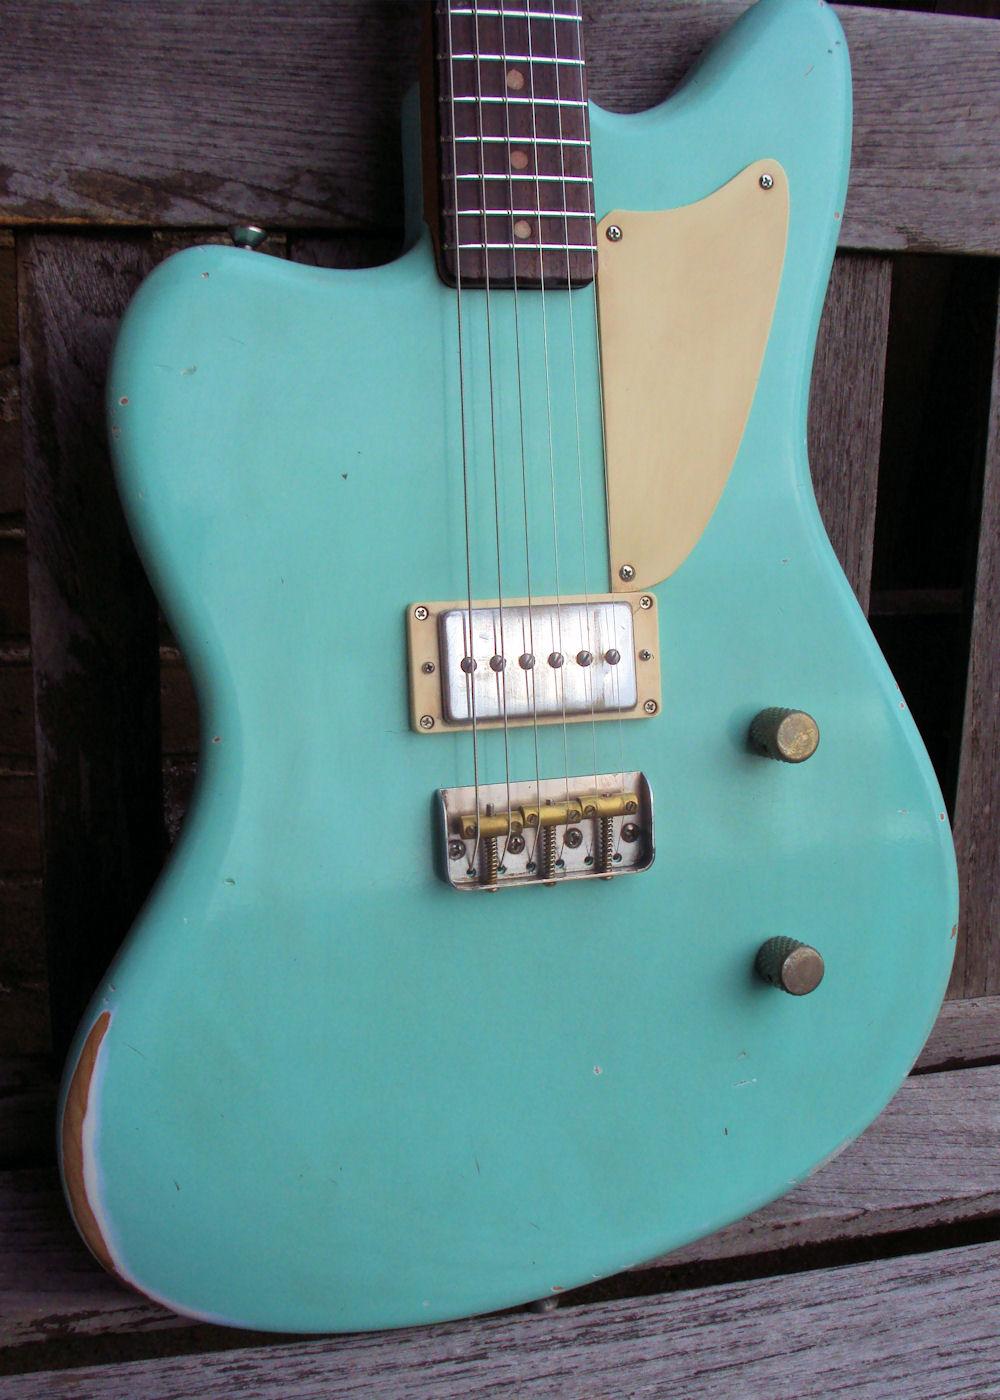 eternal guitars j type wilf made to order 1950 39 s surf green guitar for sale eternal guitars. Black Bedroom Furniture Sets. Home Design Ideas